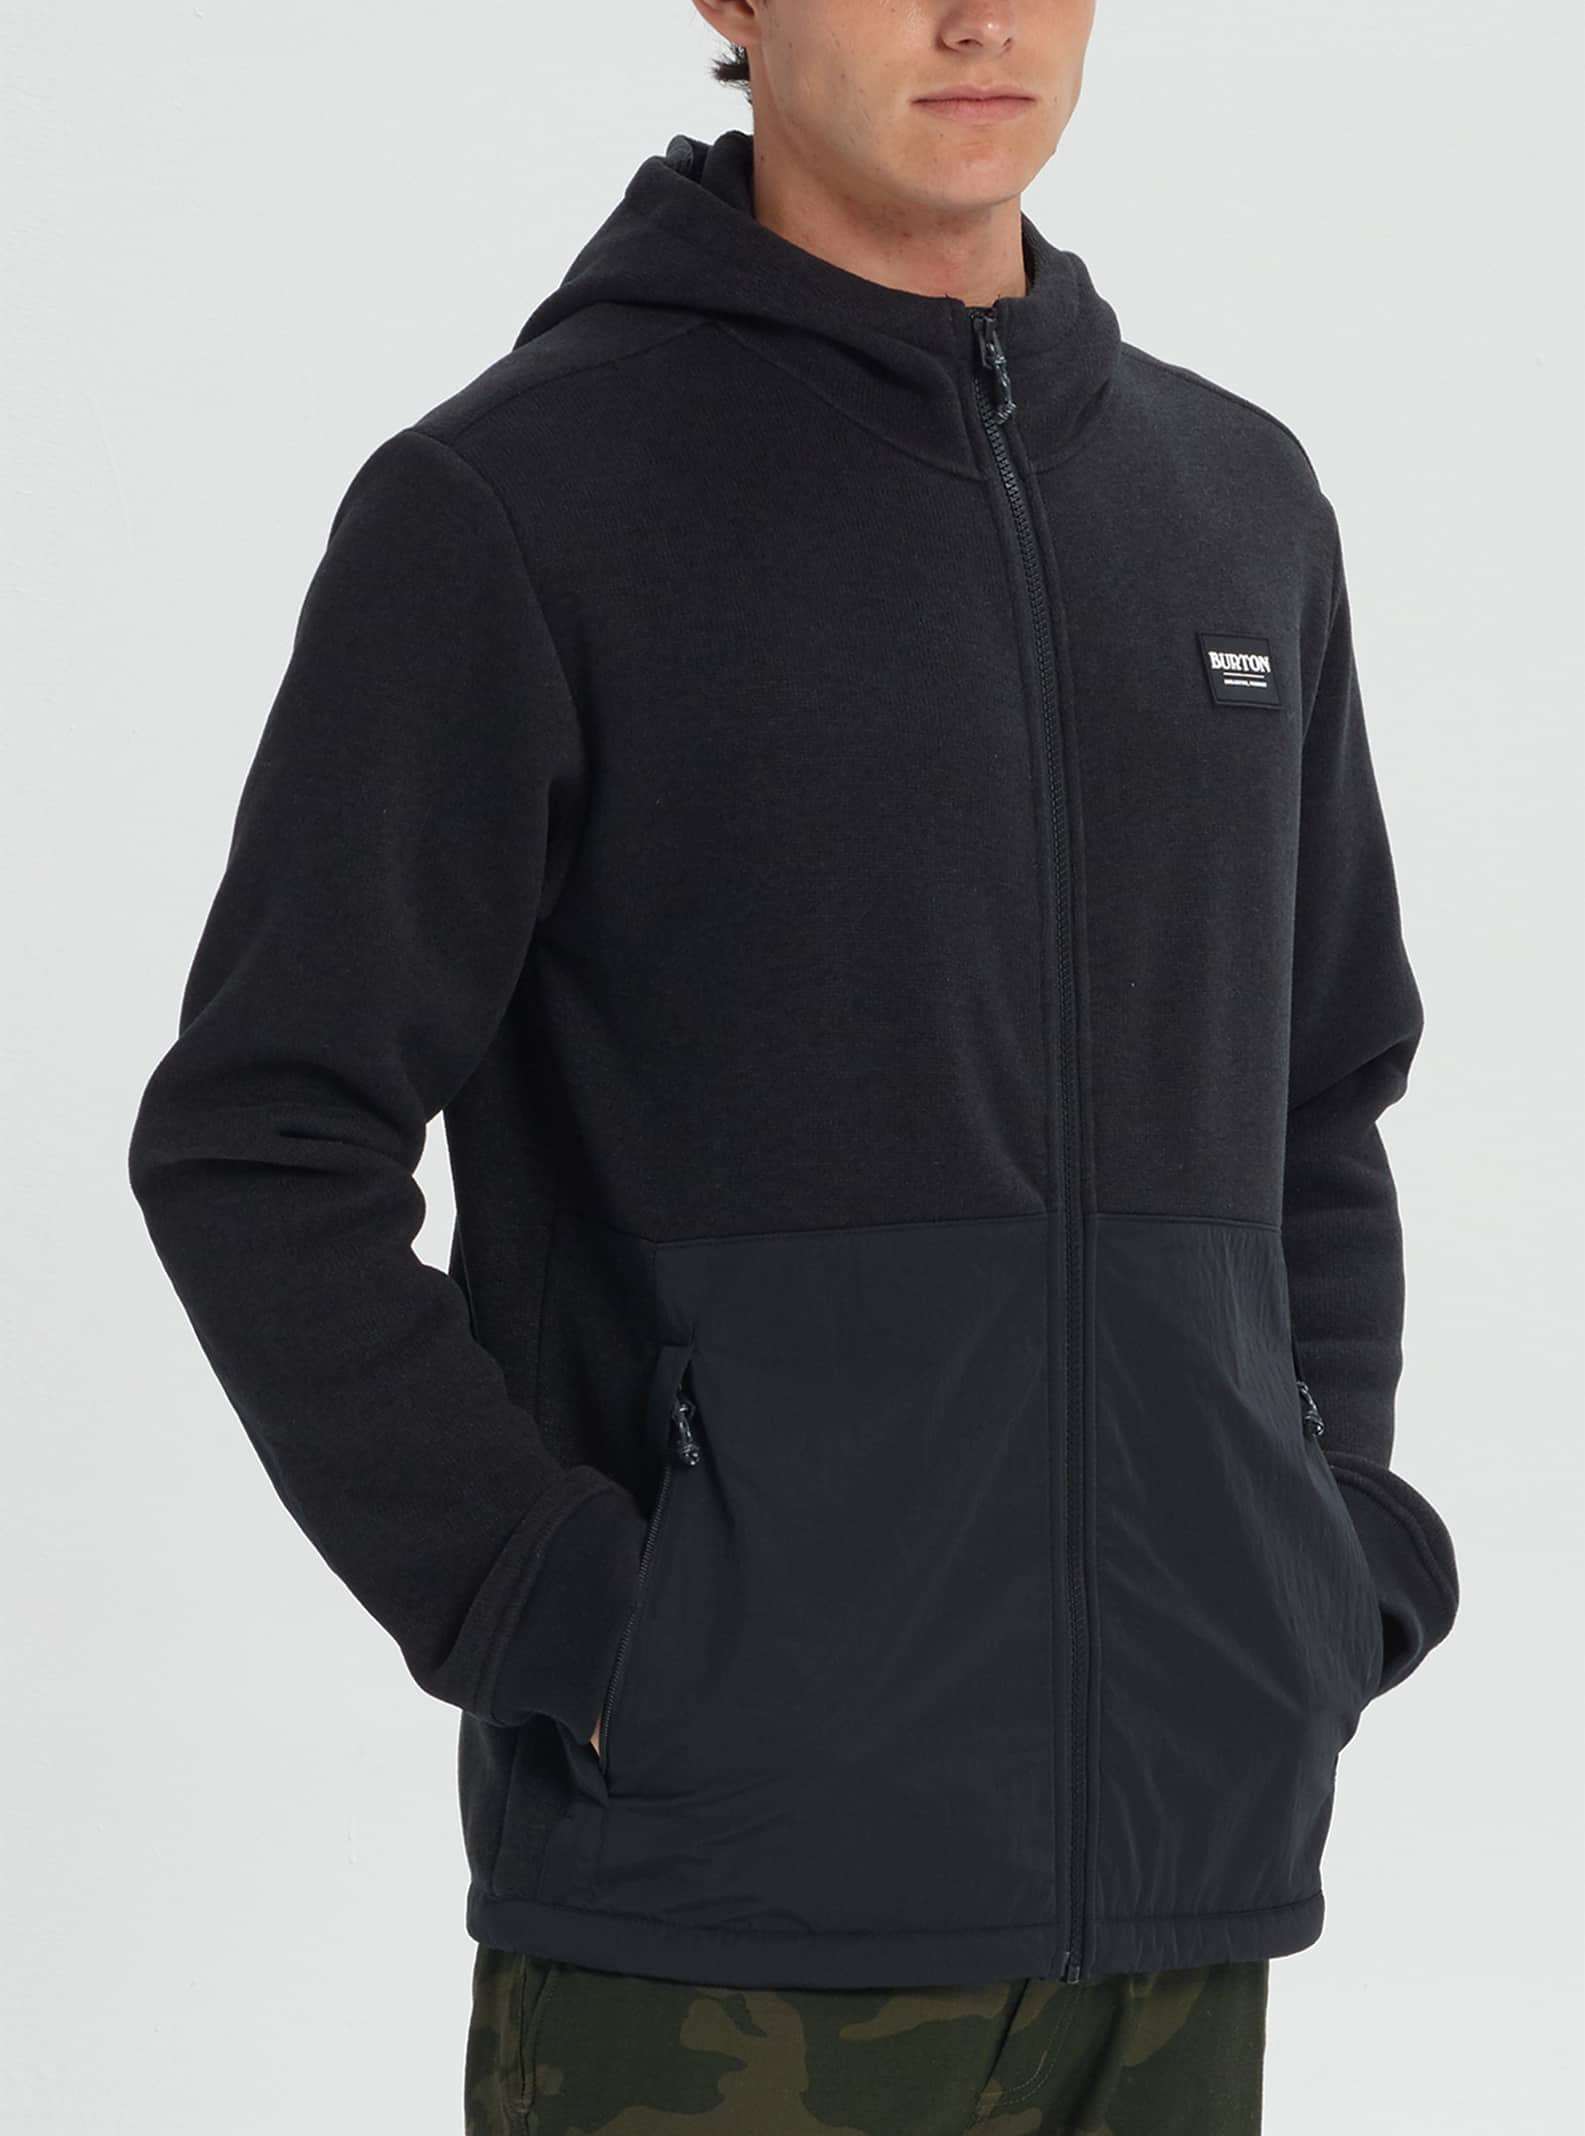 Polaire homme   Burton Snowboards